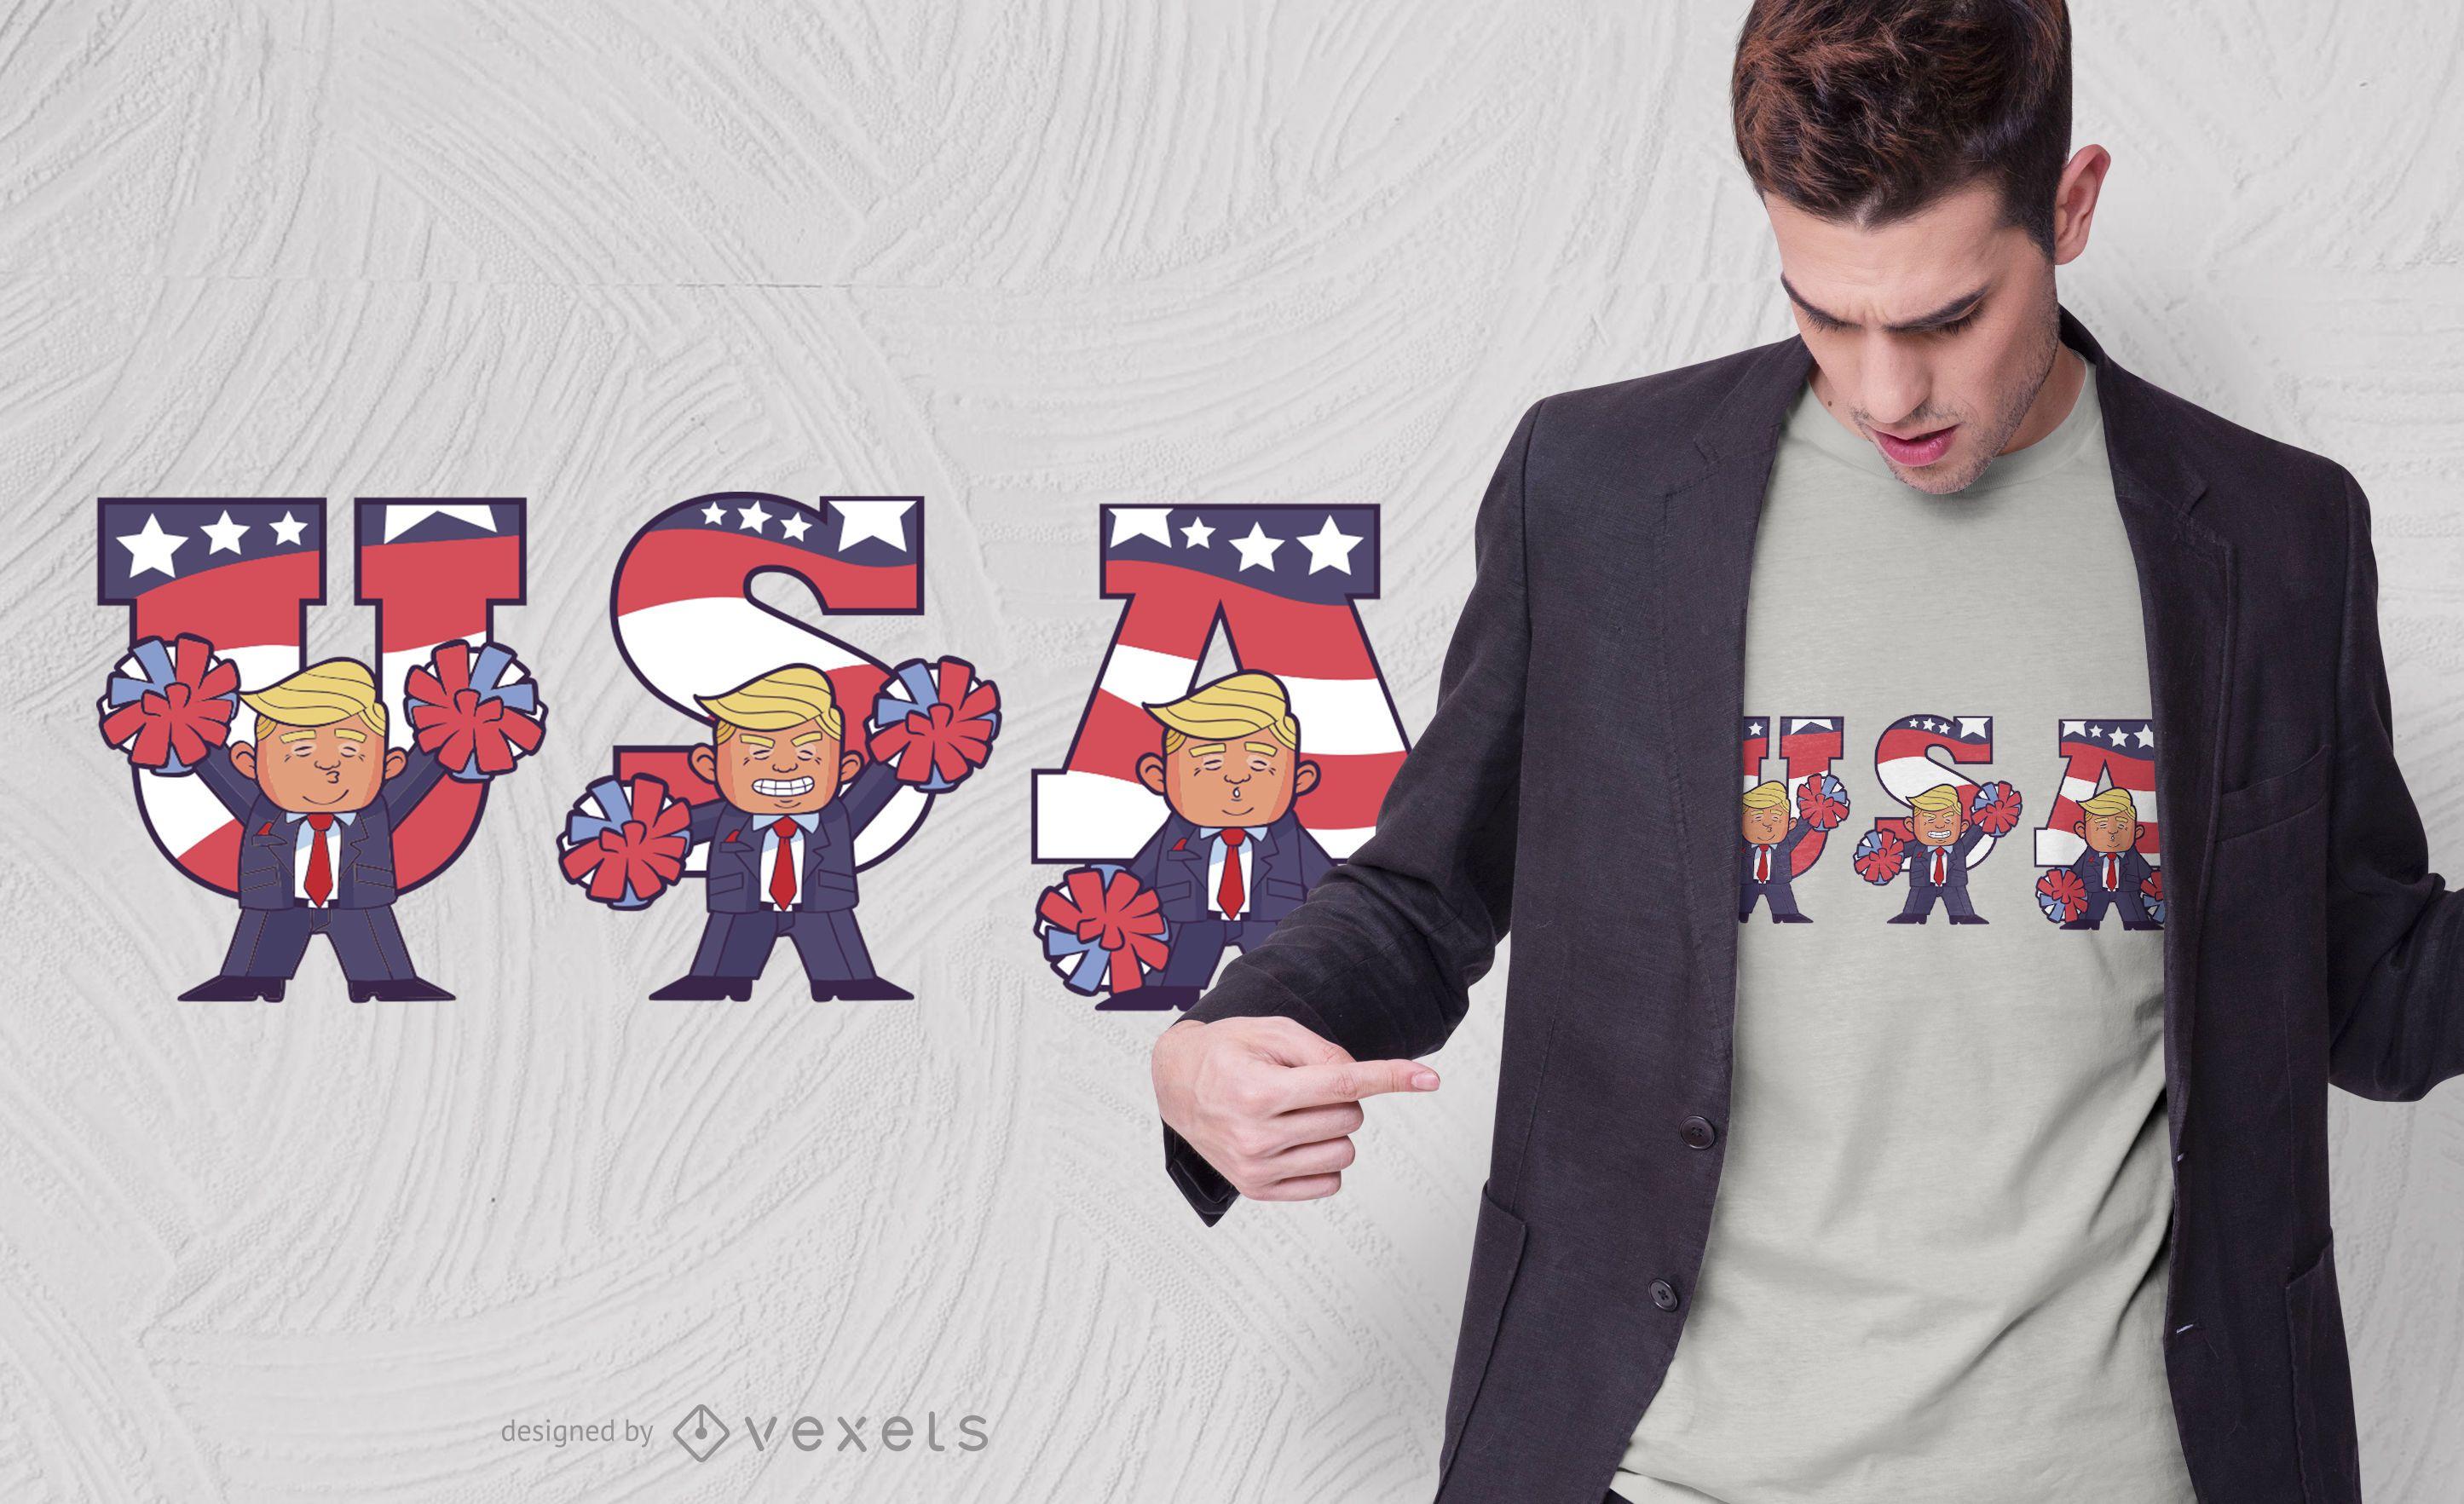 USA Trump Cartoon T-shirt Design